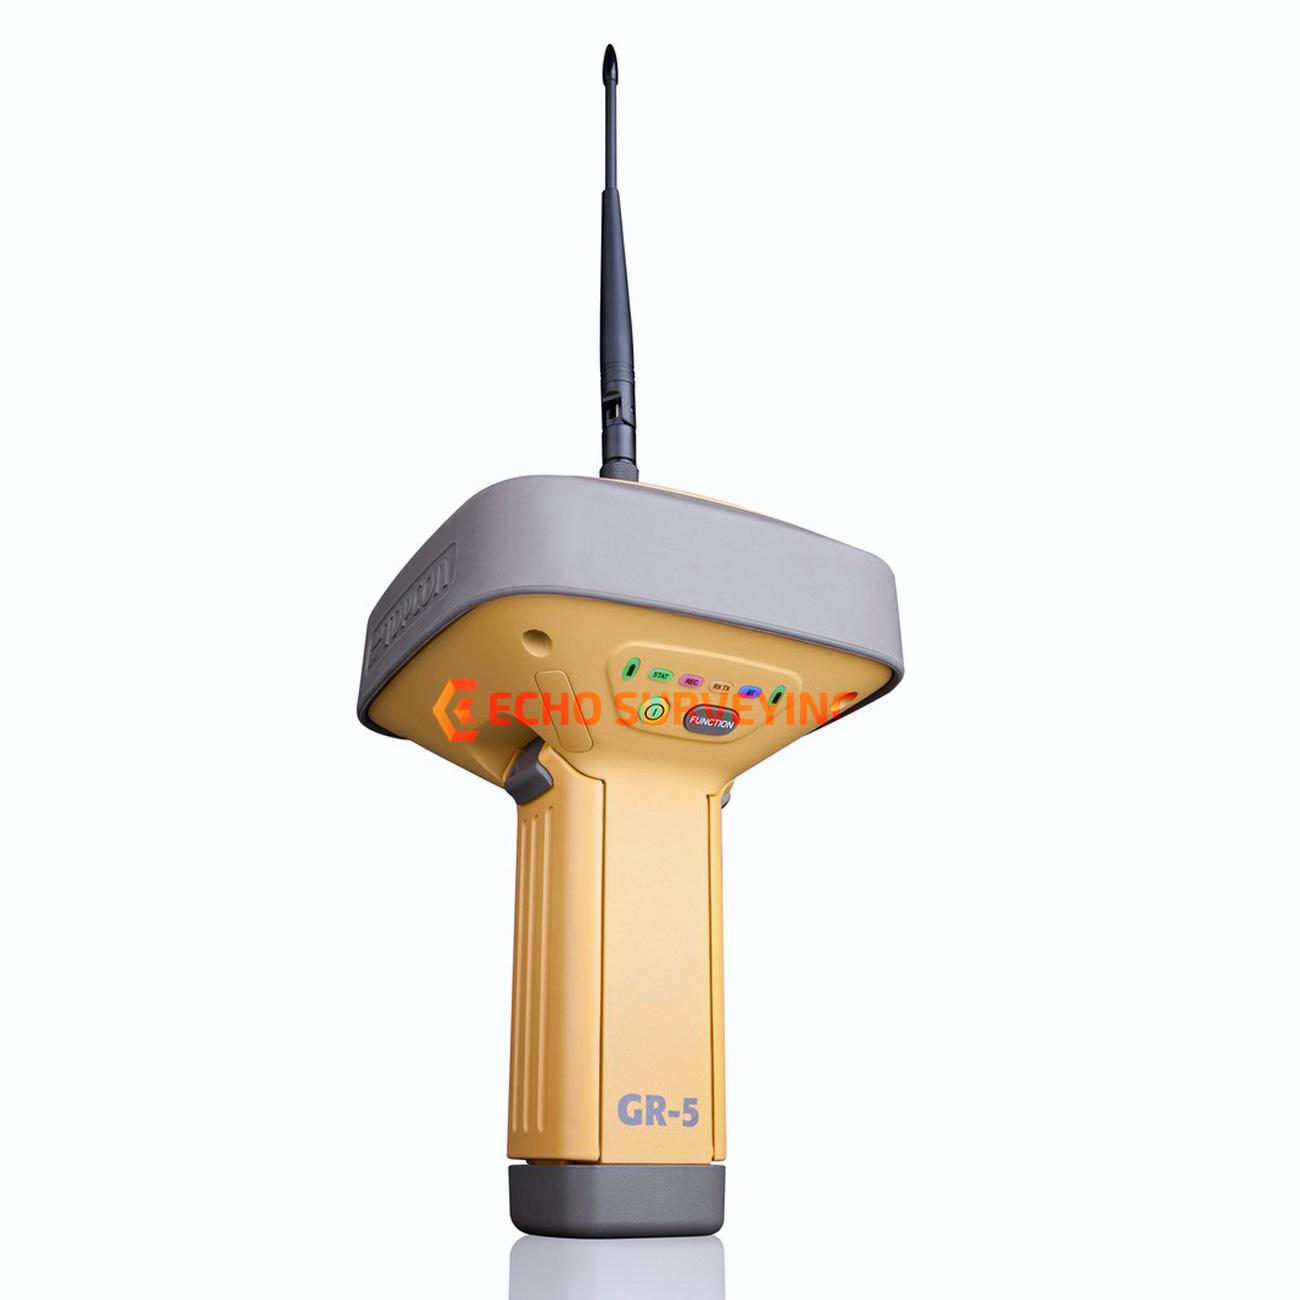 Topcon-GR-5-GNSS-Receiver.jpg